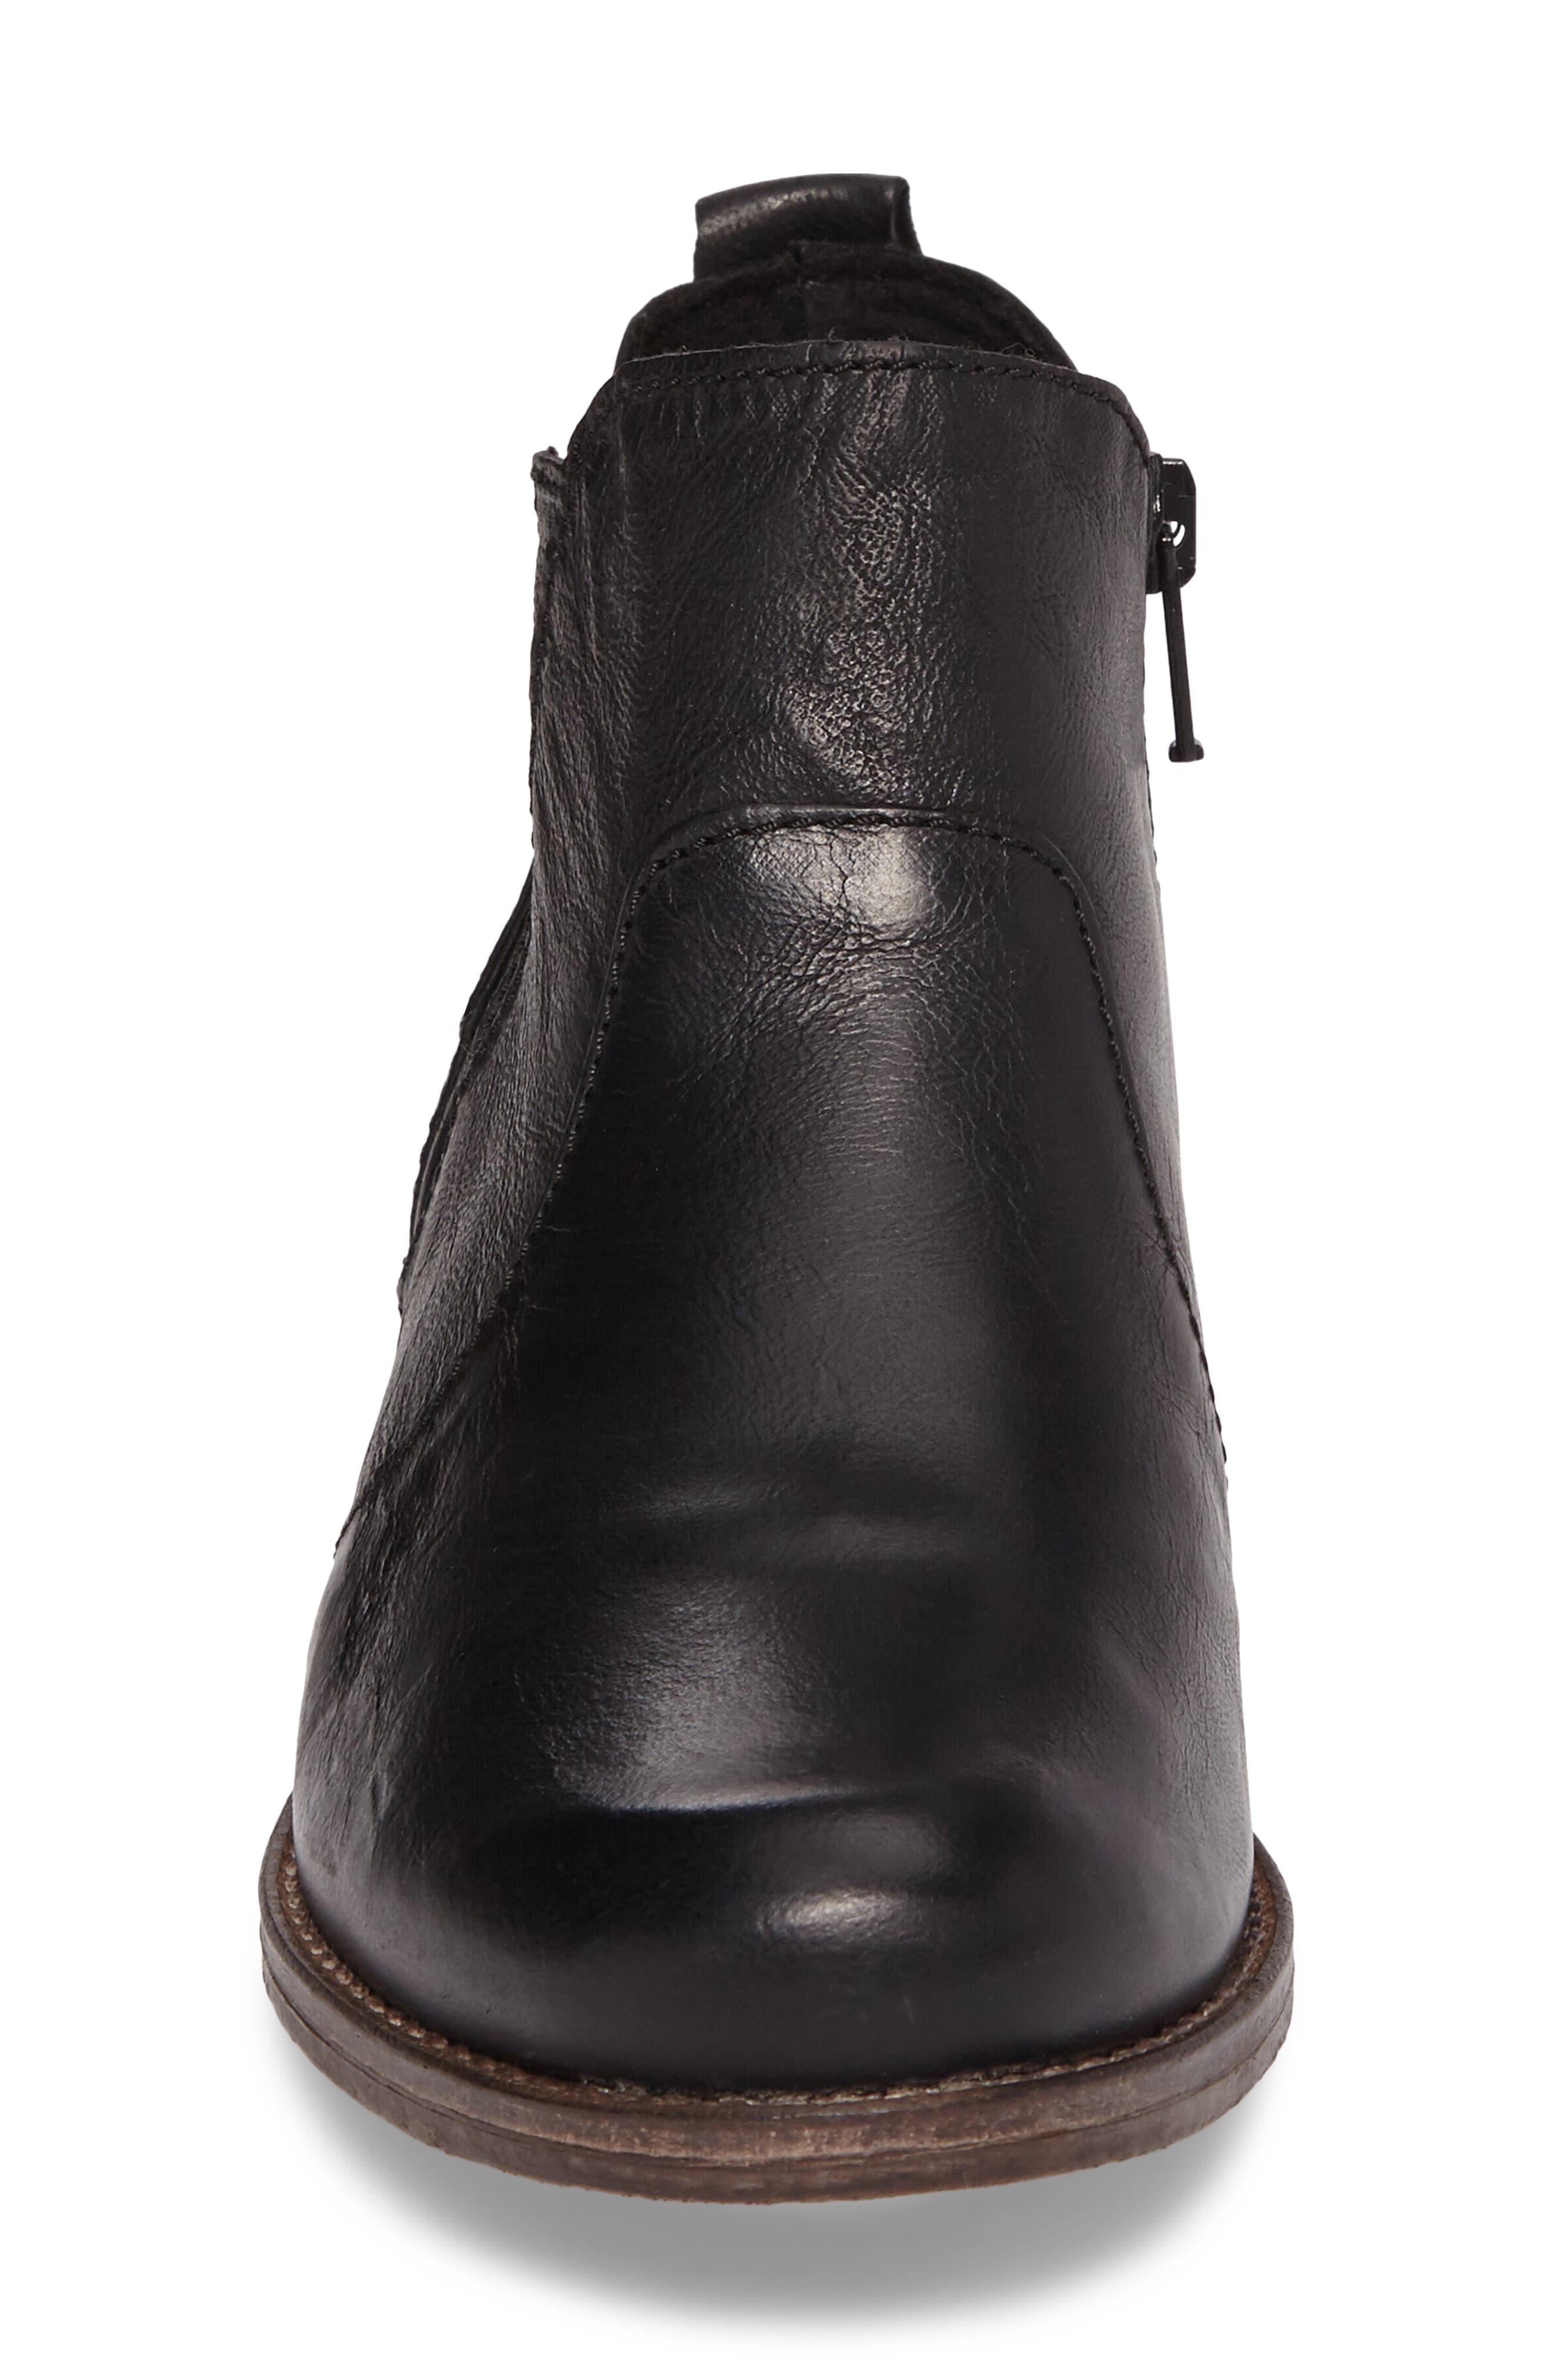 Sienna 45 Chelsea Bootie,                             Alternate thumbnail 4, color,                             Black Leather